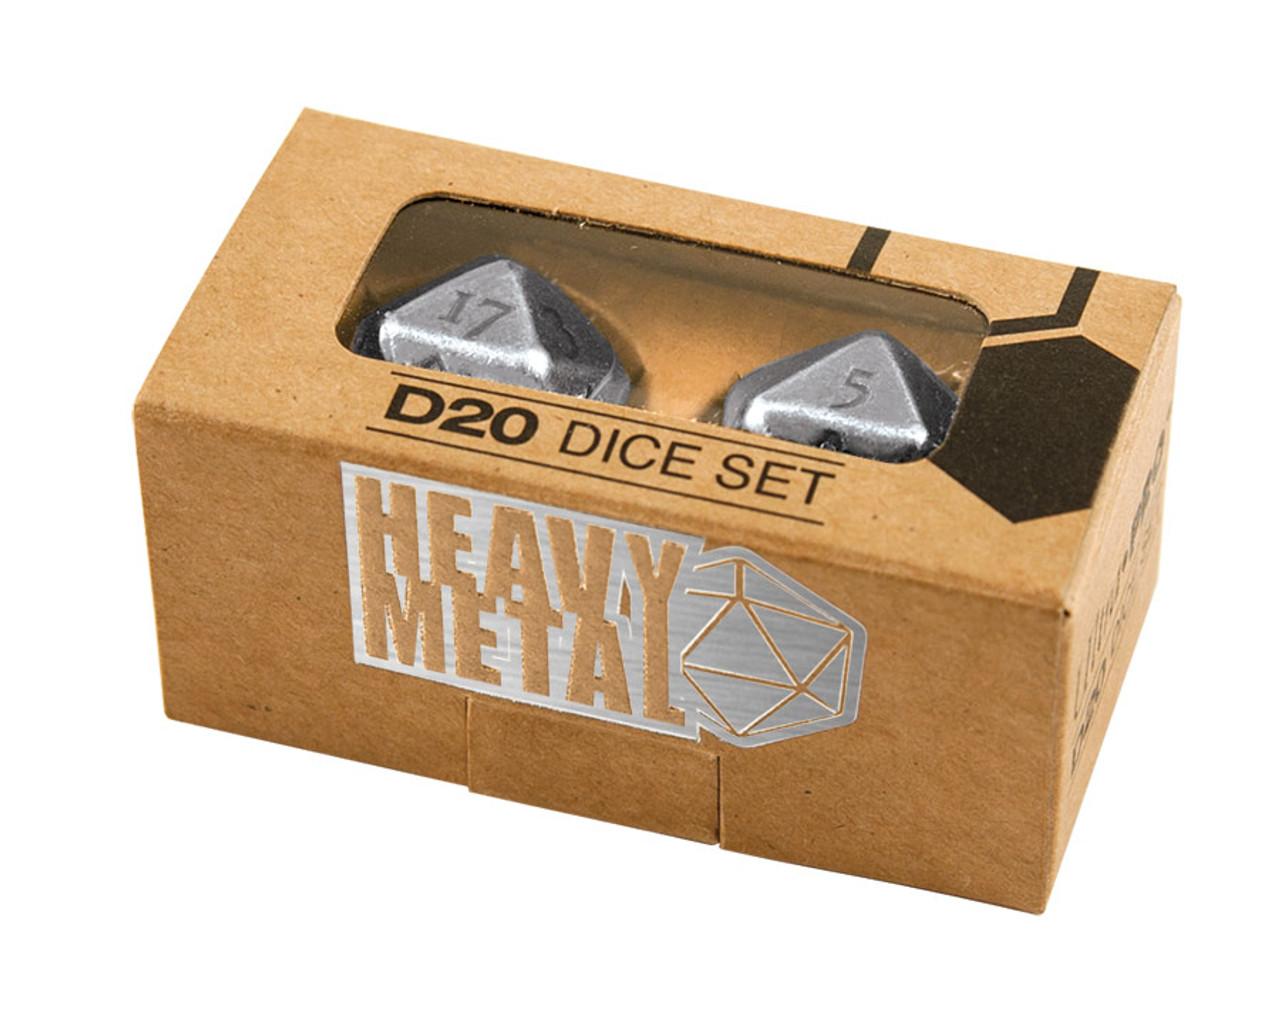 Ultra Pro Dice - D20 2 Dice Set Chrome - Special Order